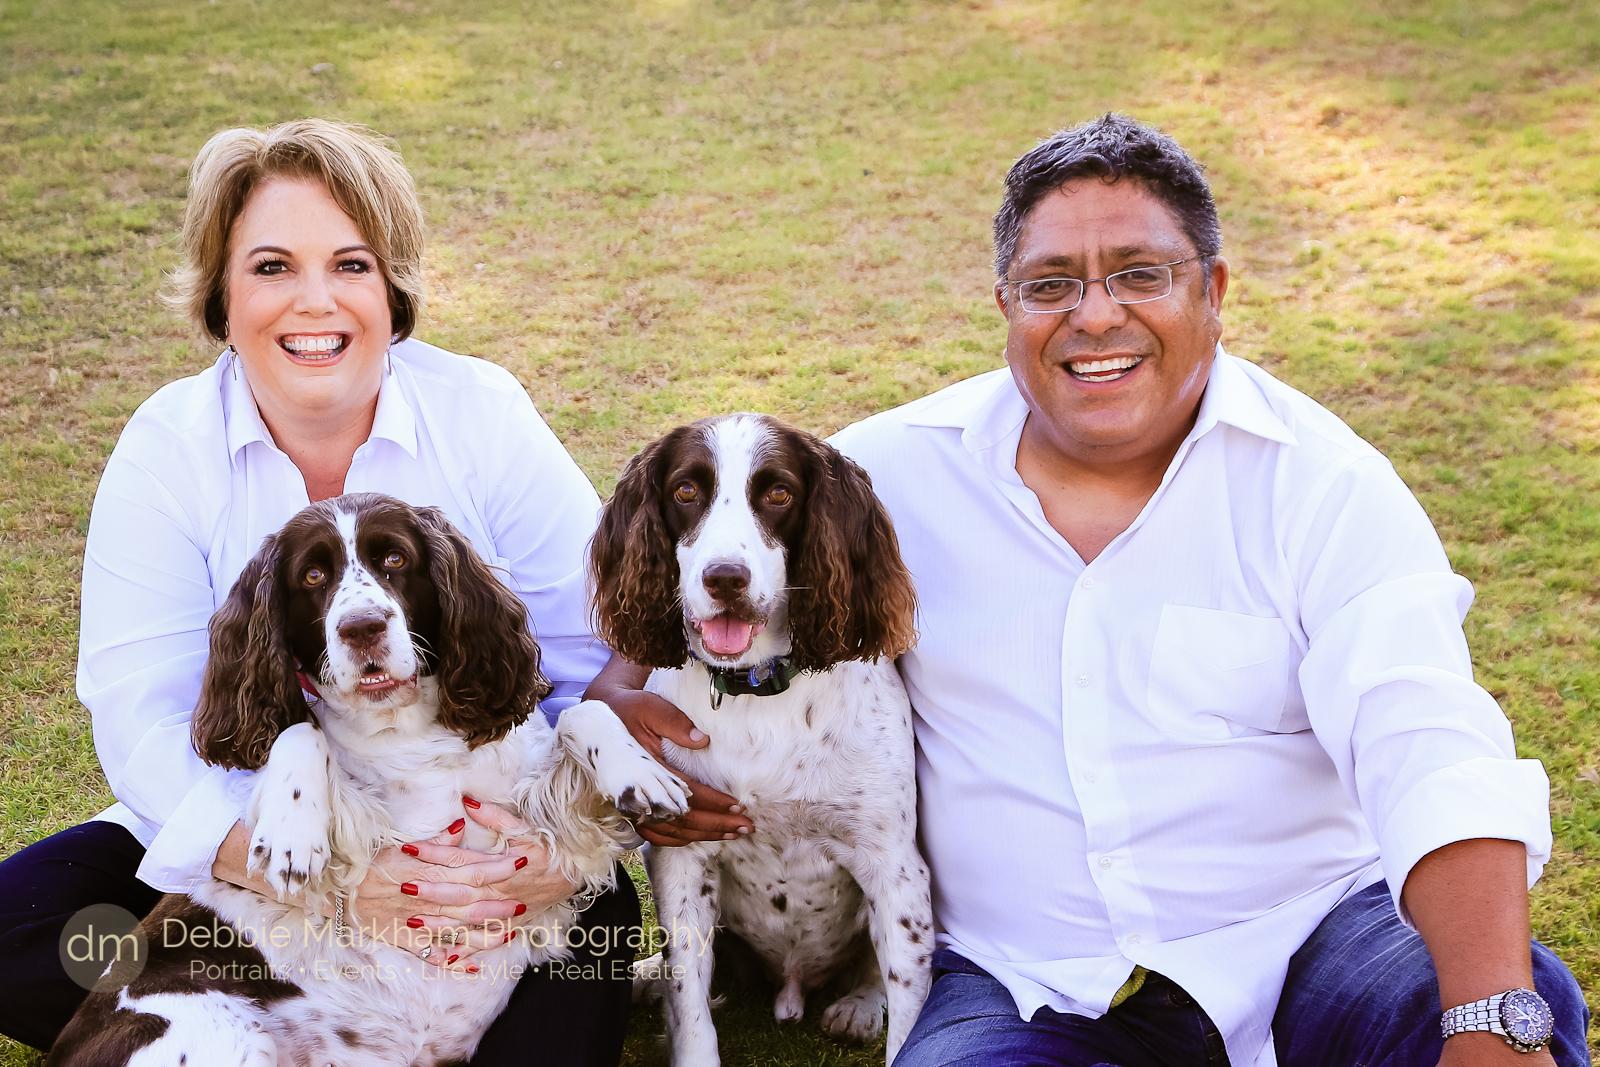 Debbie Markham Photography+Pet Photographer+Portraits+Dogs+Central Coast+San Simeon+Cambria+California-3580